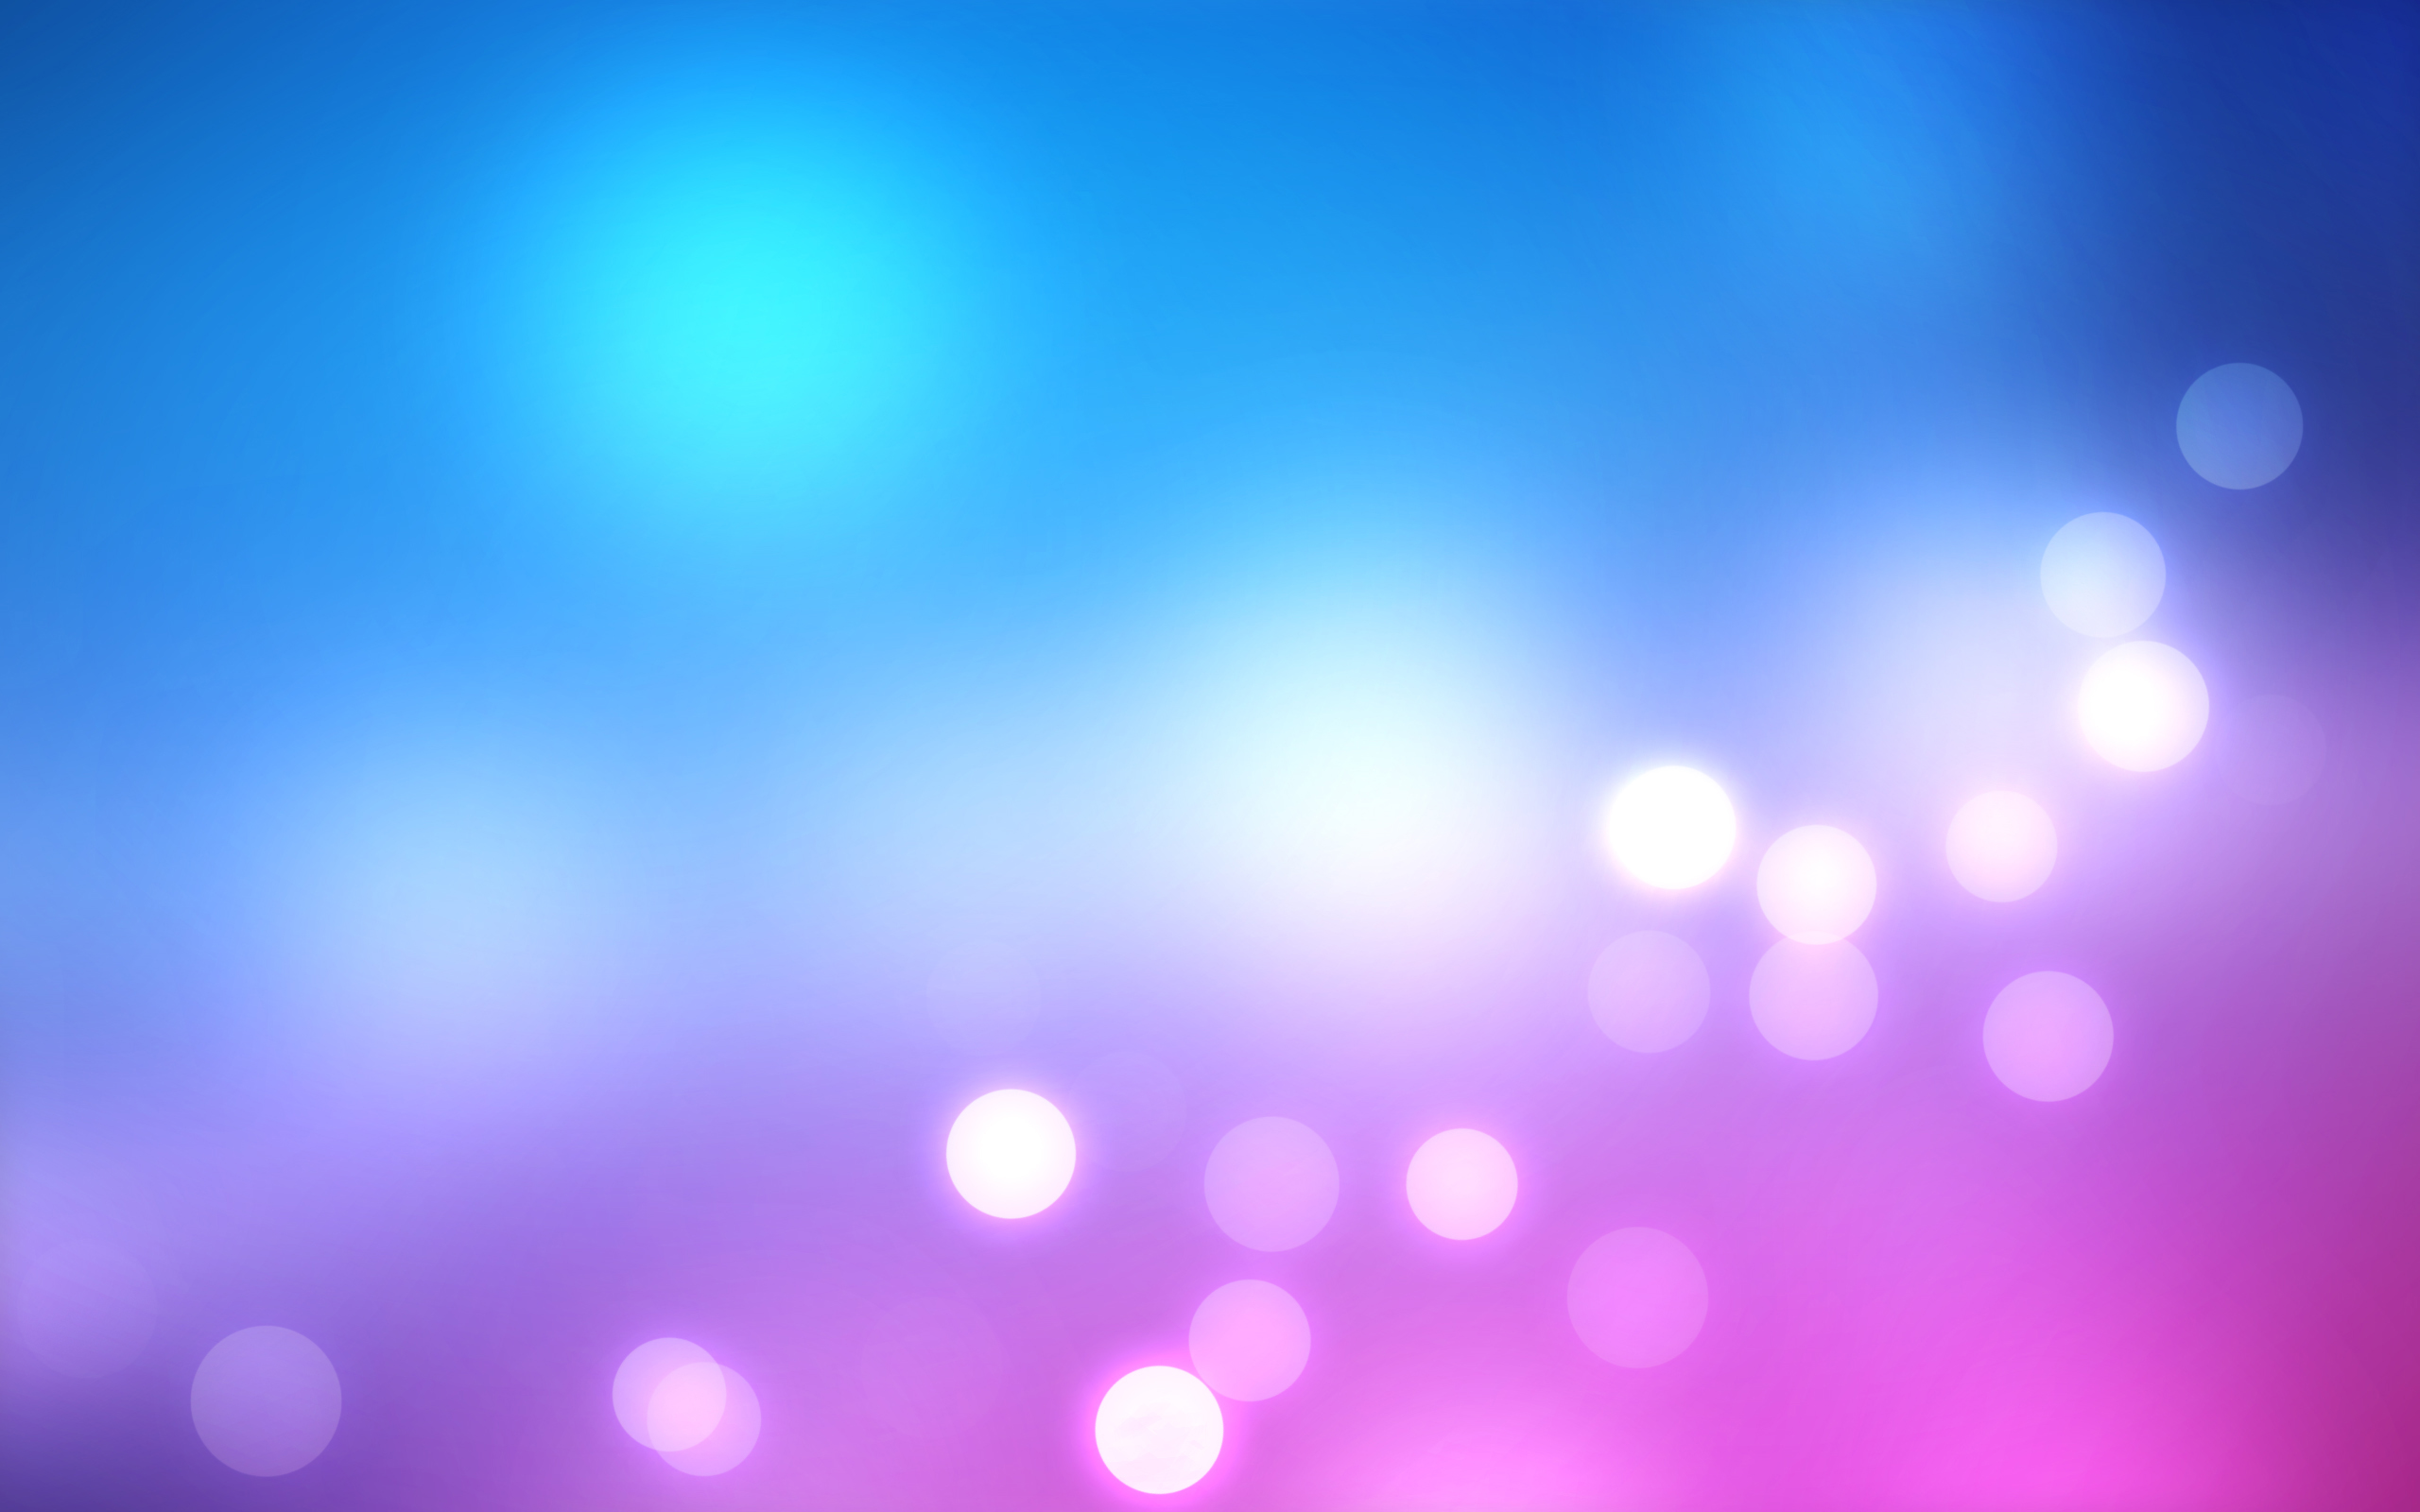 Artistic Hd Wallpaper Background Image 2560x1600 Id 117357